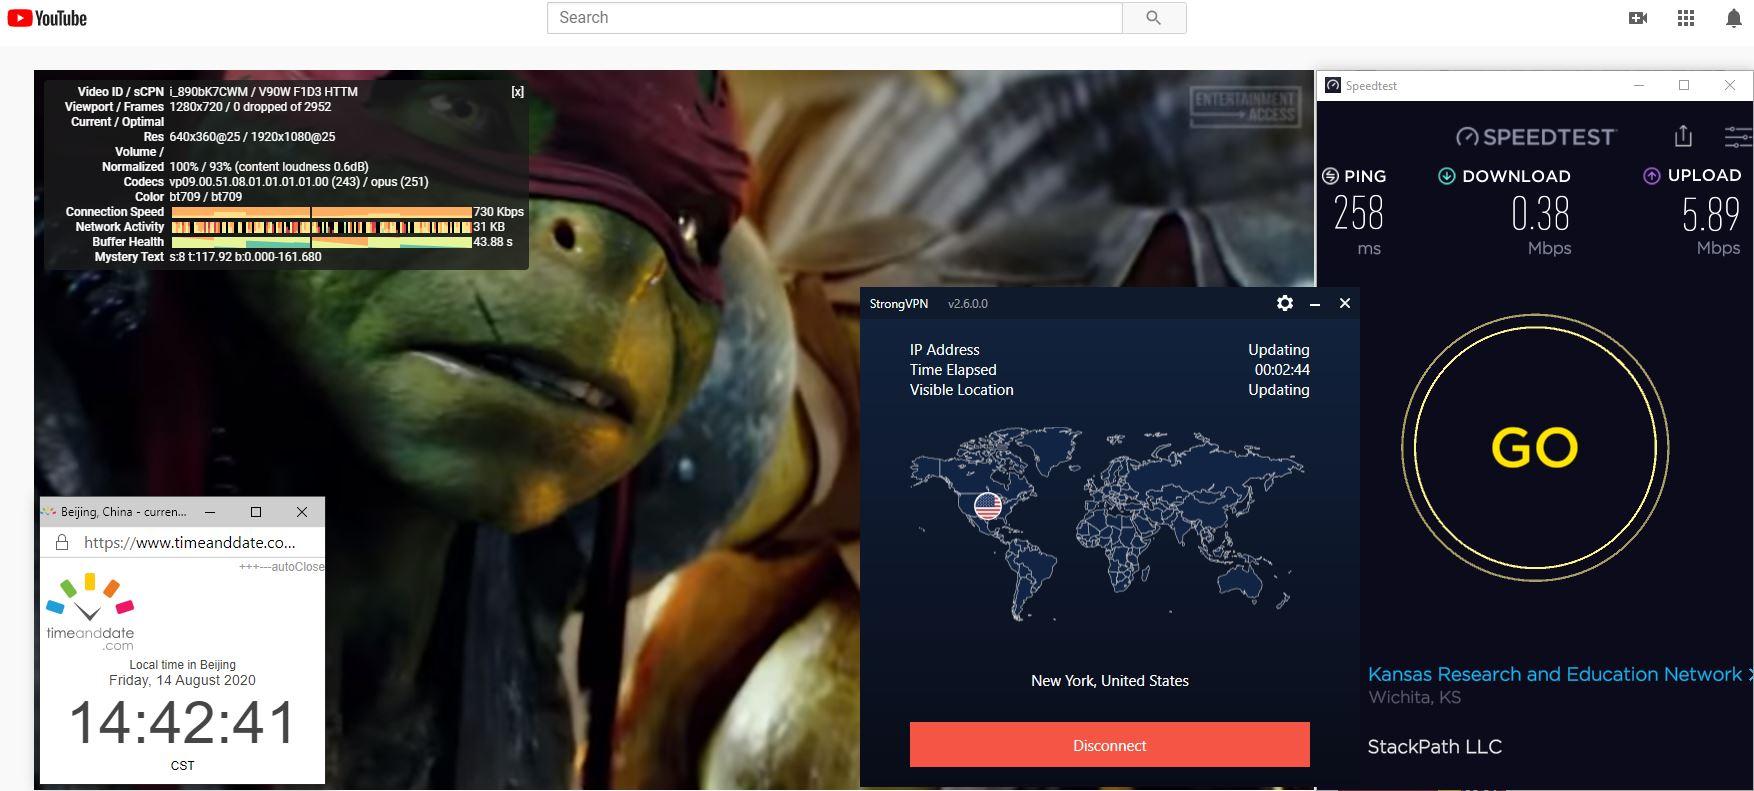 Windows10 StrongVPN IKEv2 USA - Now York 中国VPN 翻墙 科学上网 翻墙速度测试 - 20200814